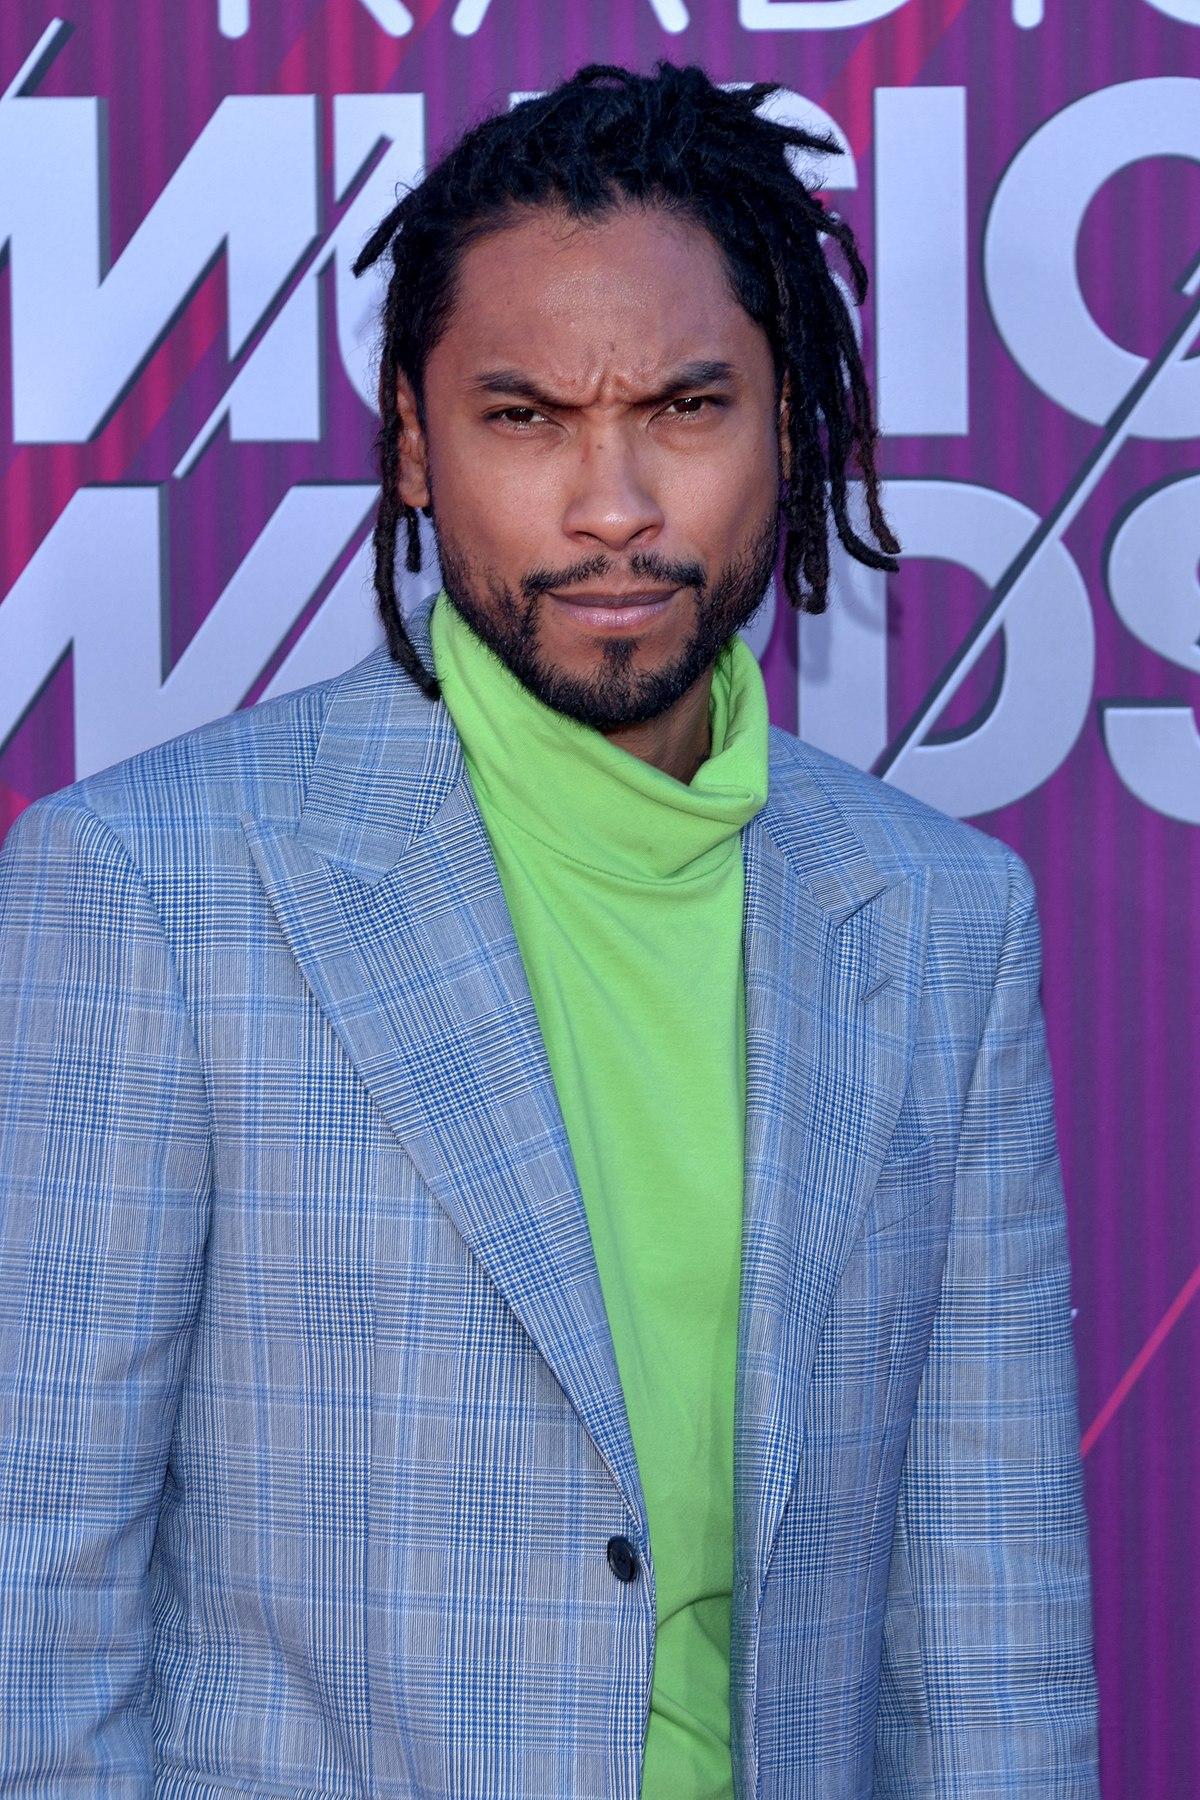 Miguel (singer) - Wikipedia